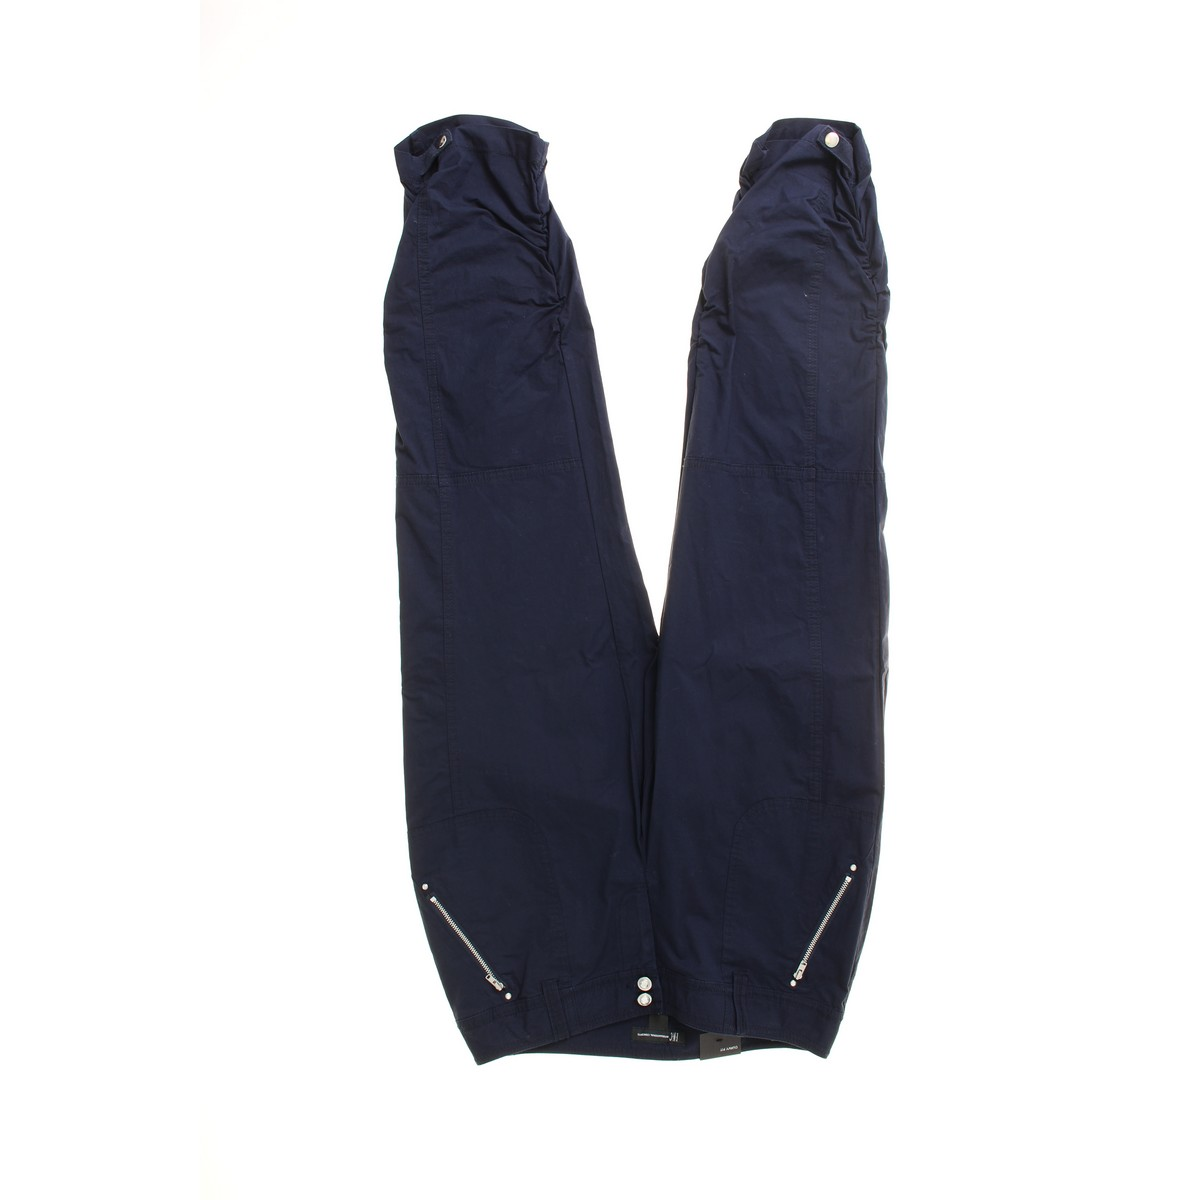 Creative 25 Lastest Cargo Pants Womens Old Navy U2013 Playzoa.com